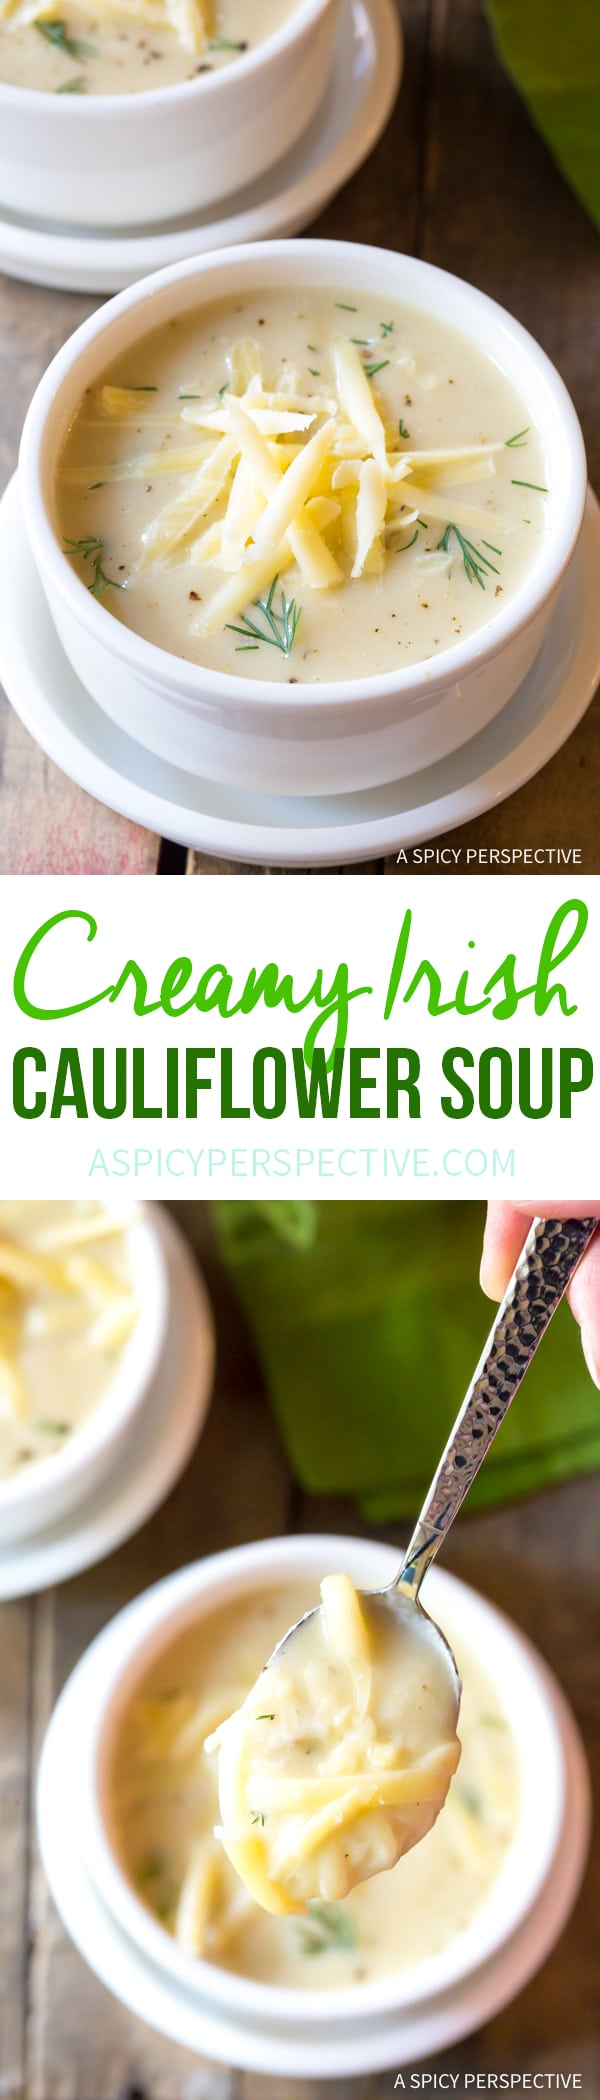 Irresistible Irish Creamy Cauliflower Soup Recipe for Saint Patrick's Day!